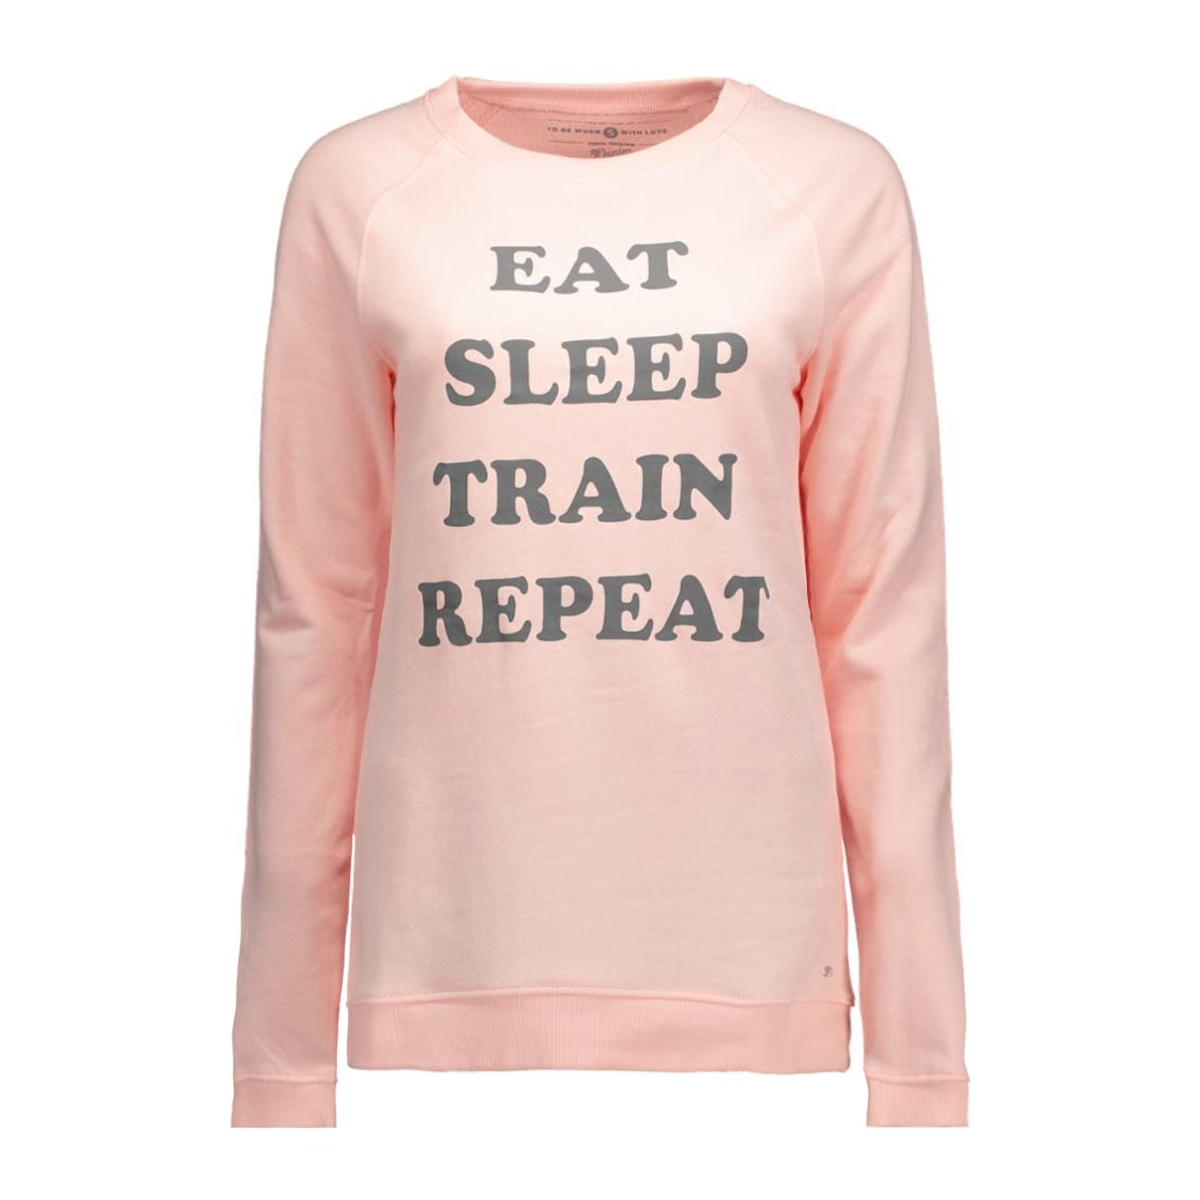 2530411.00.71 tom tailor sweater 4728